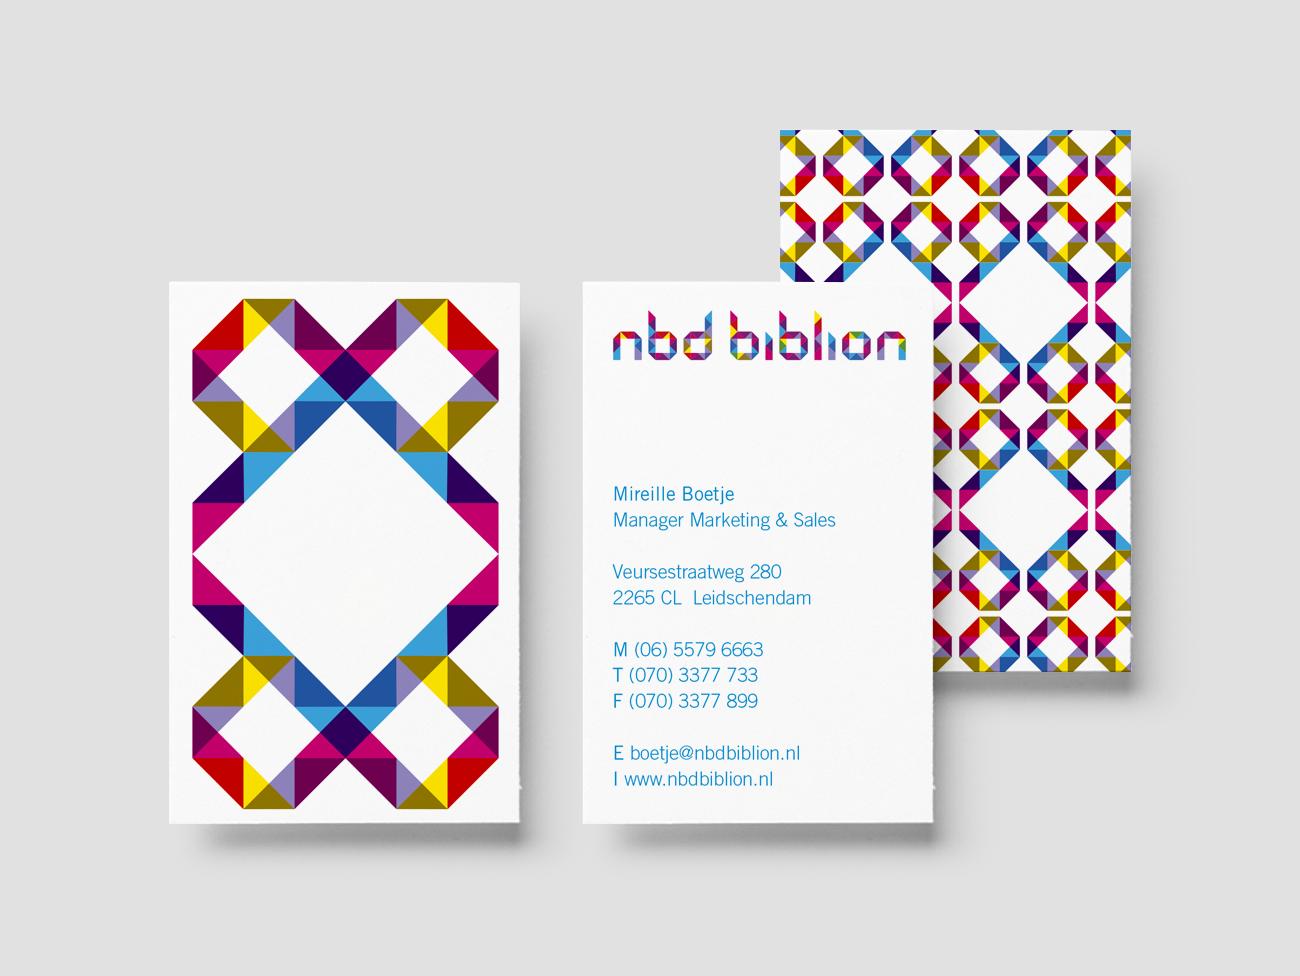 NBD Biblion, Studio Enkelvoud